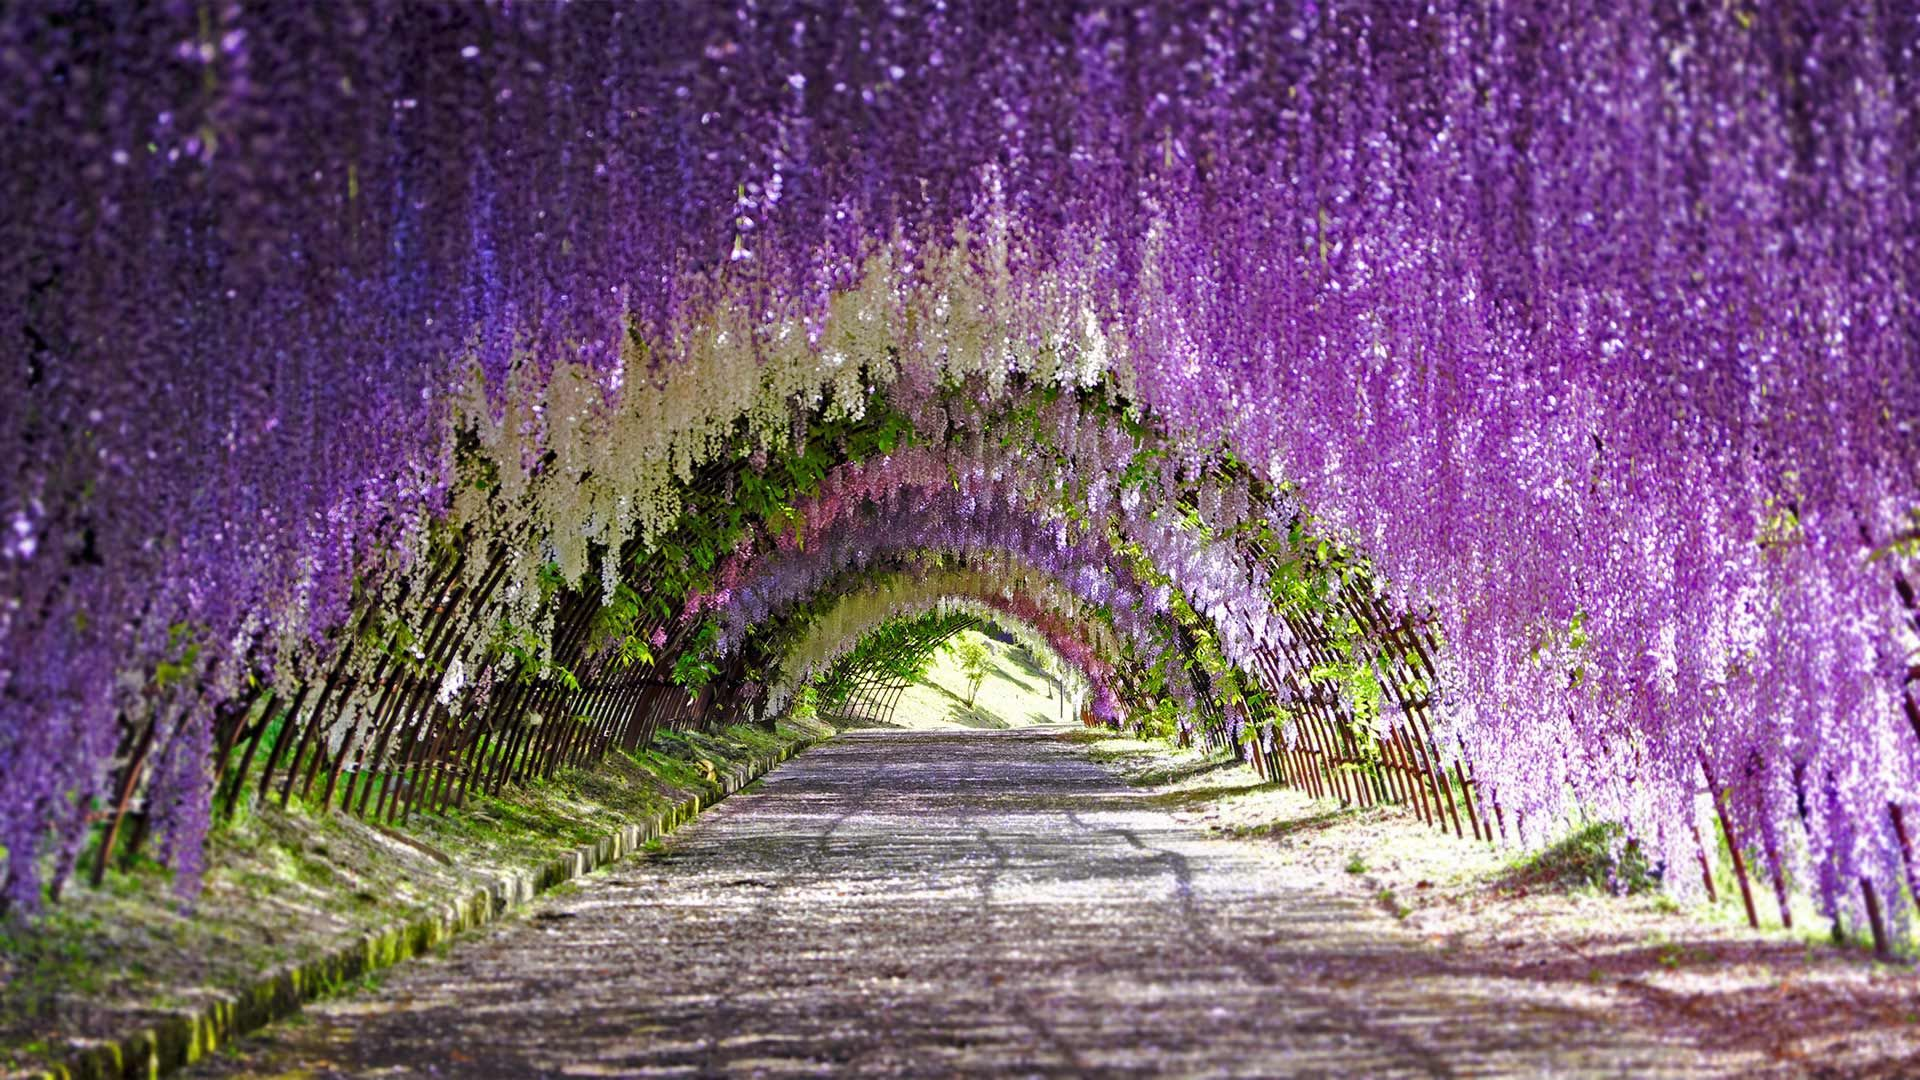 Wisteria blooms at Kawachi Fuji Gardens in Kitakyushu, Japan